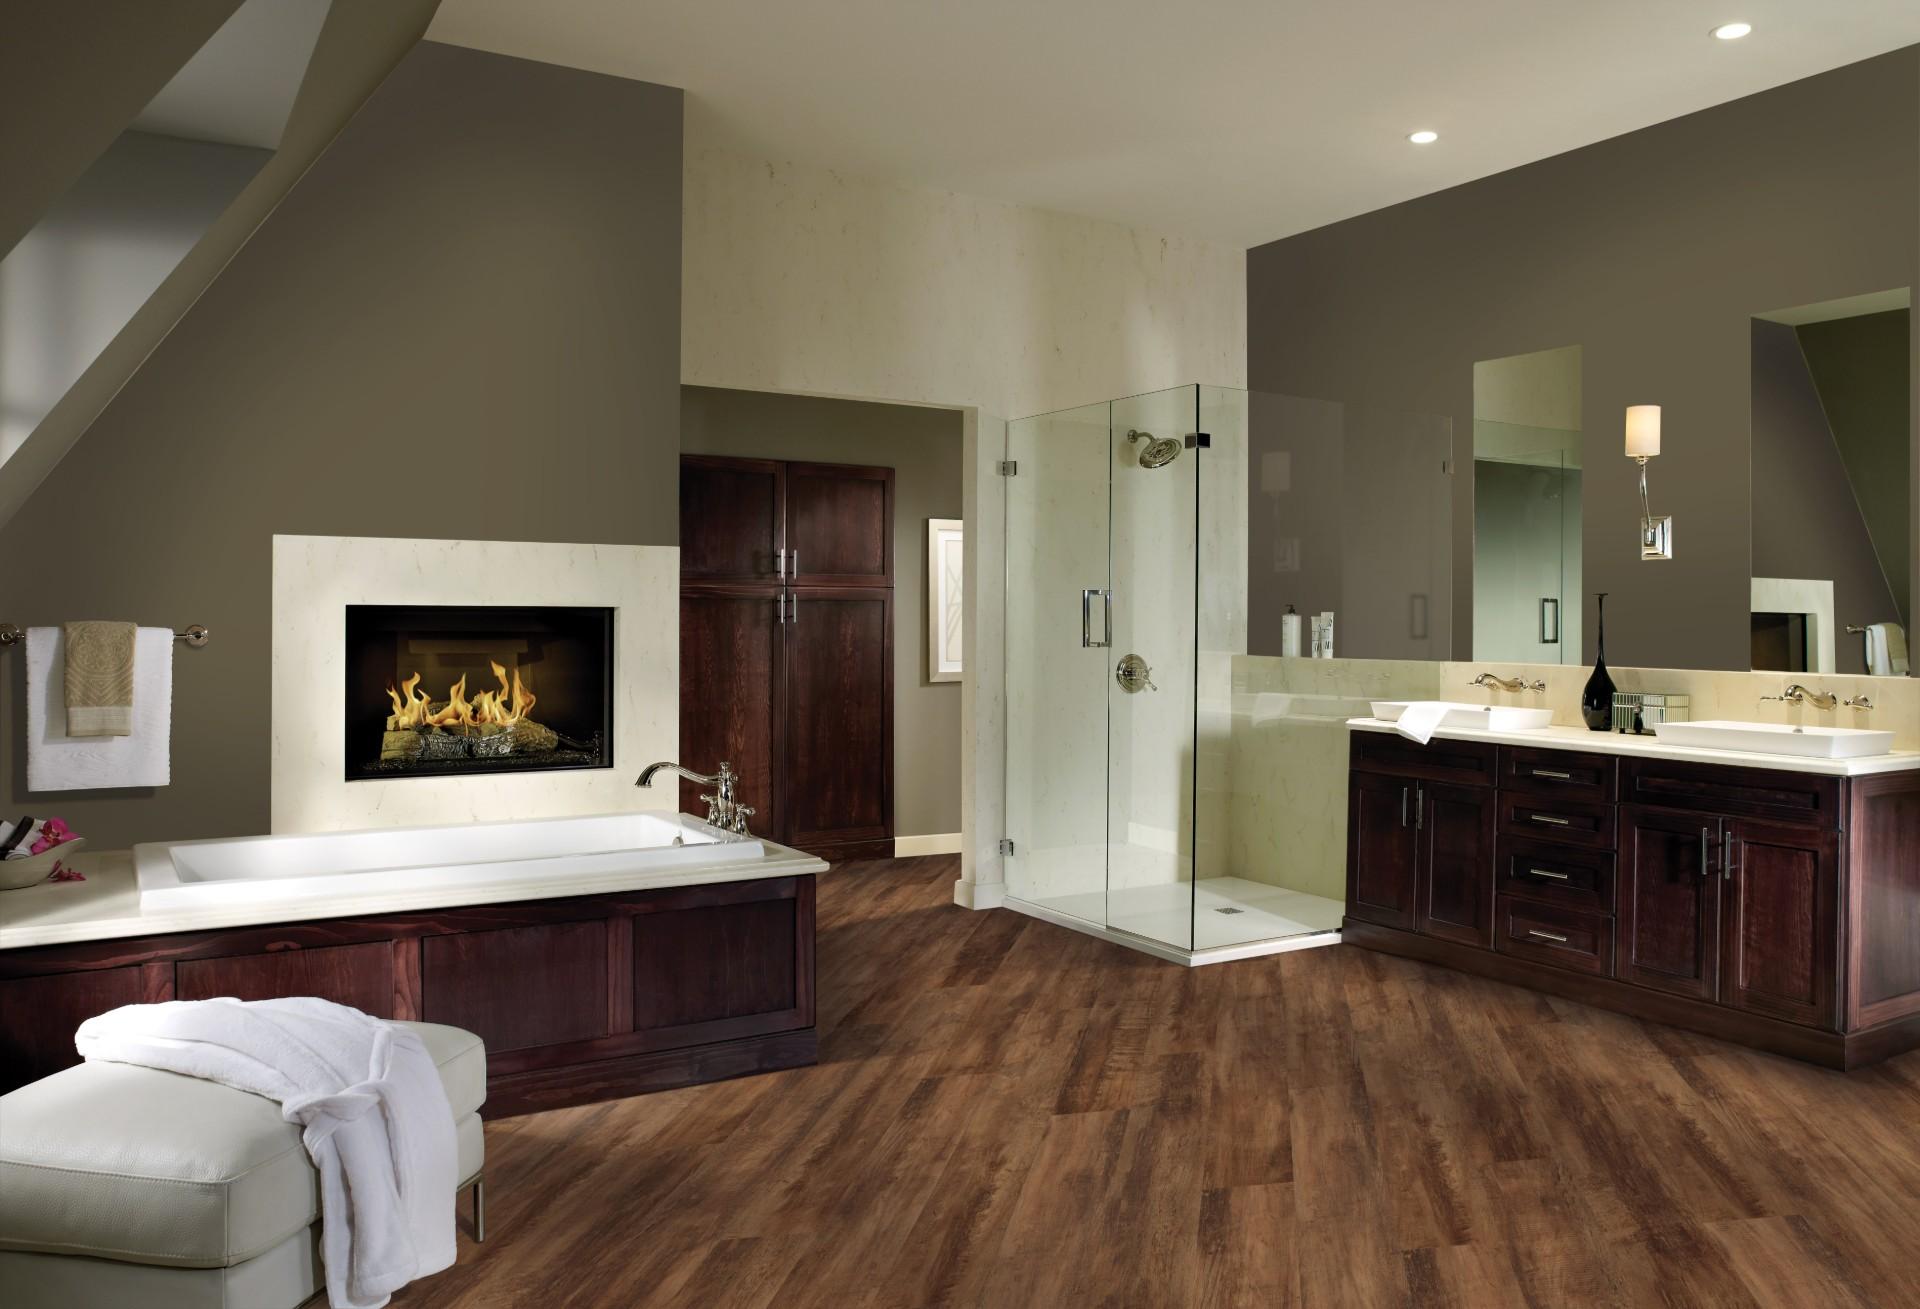 Waterproof bathroom flooring in Omaha Nebraska